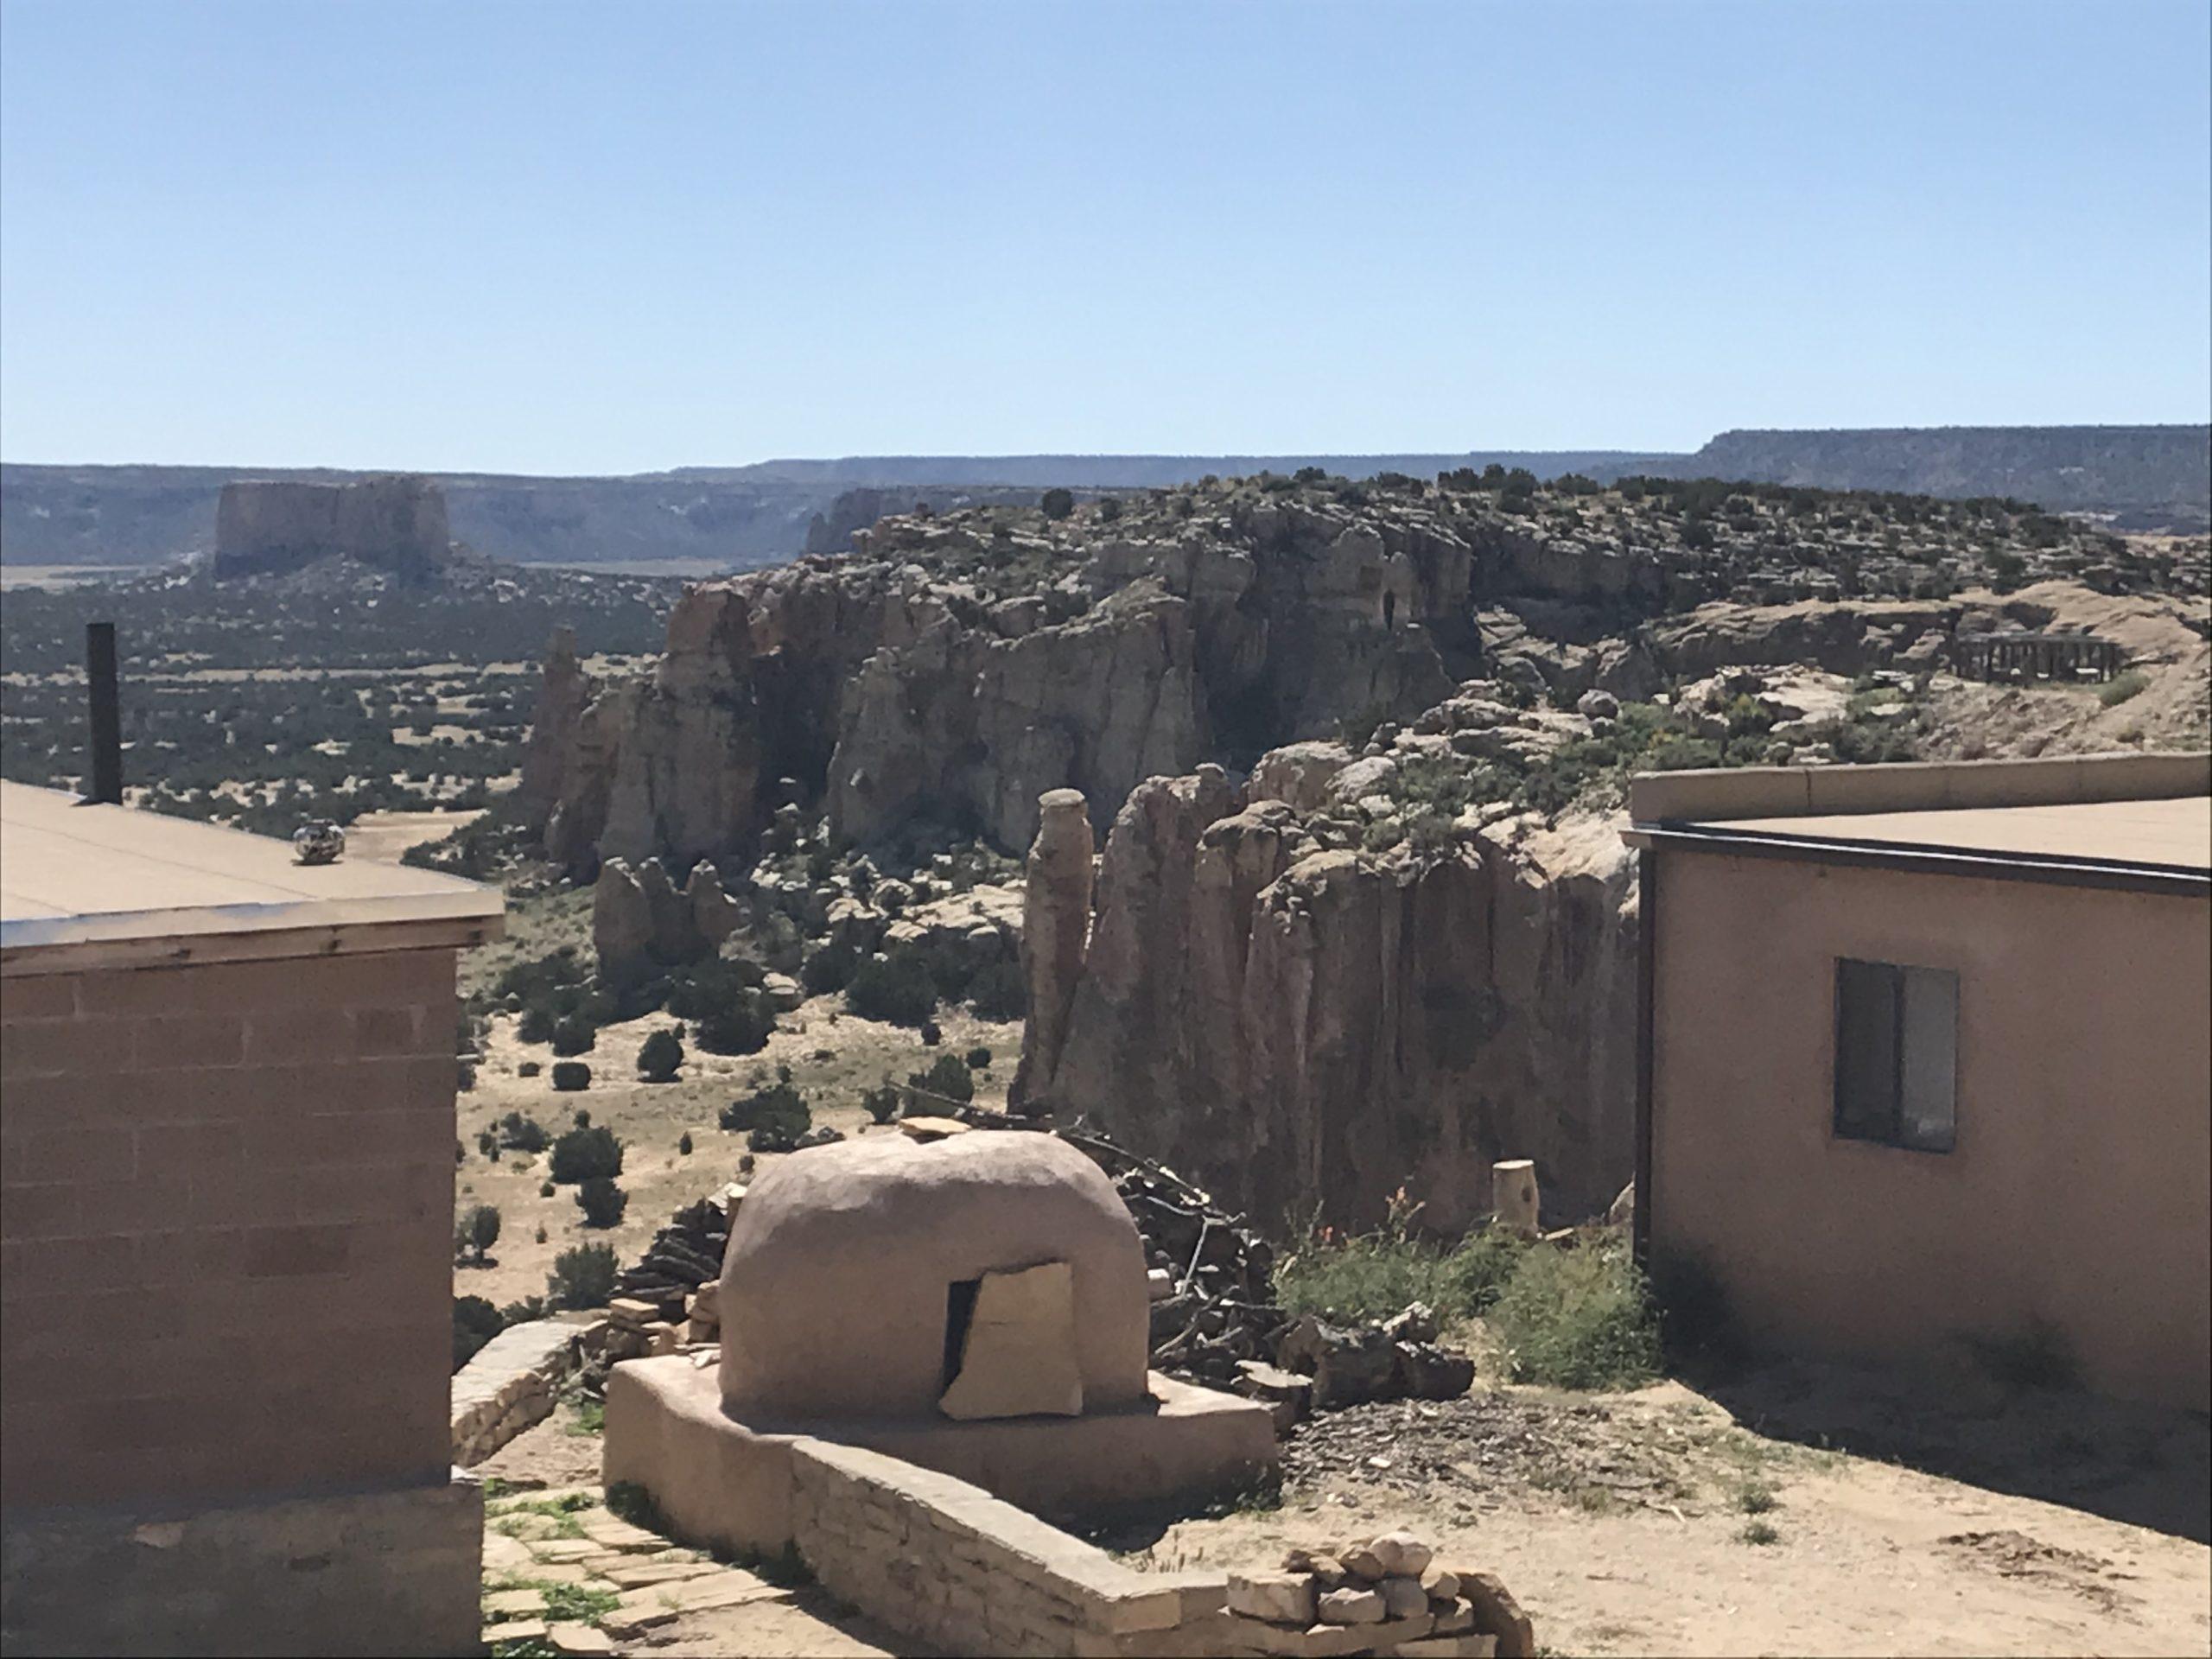 Revisiting Acoma Pueblo – Through Fresh Eyes